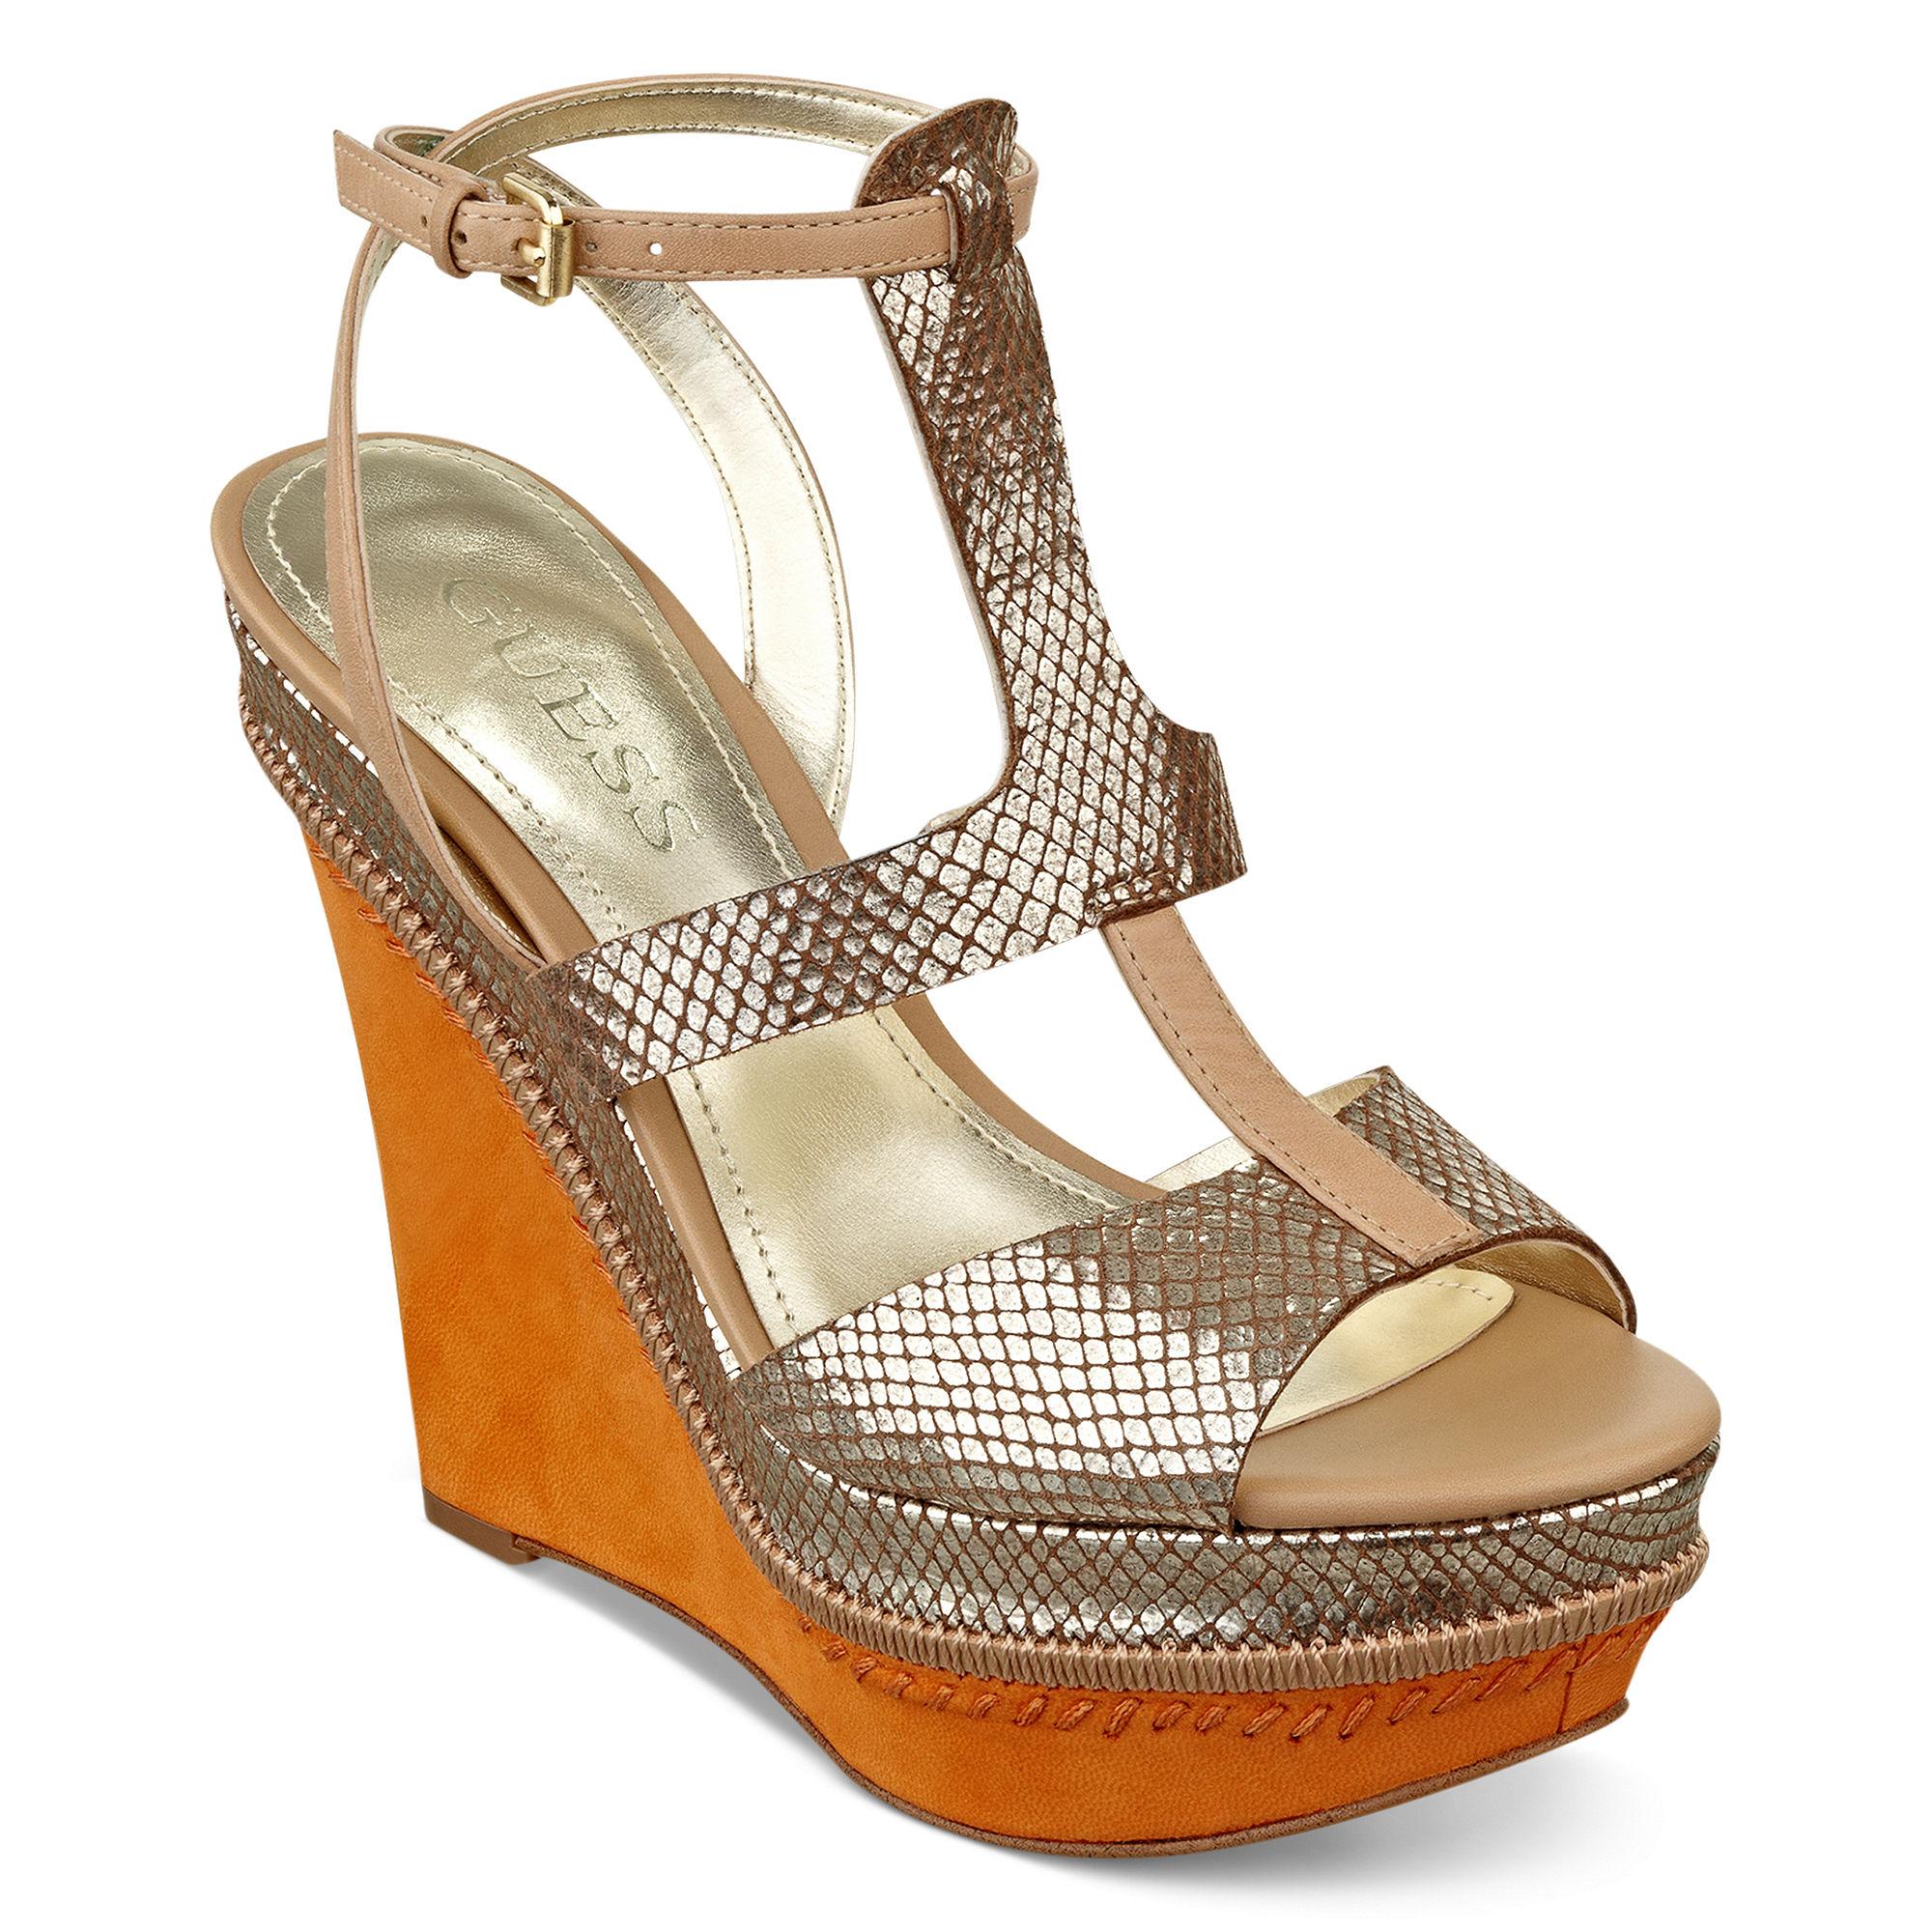 guess diastol platform wedge sandals in gold gold multi